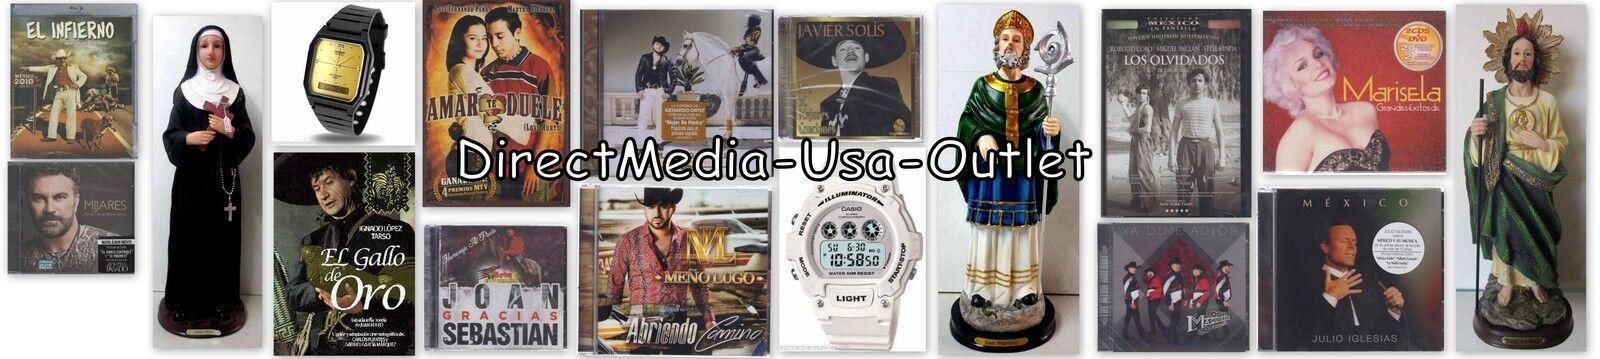 DirectMedia-Usa